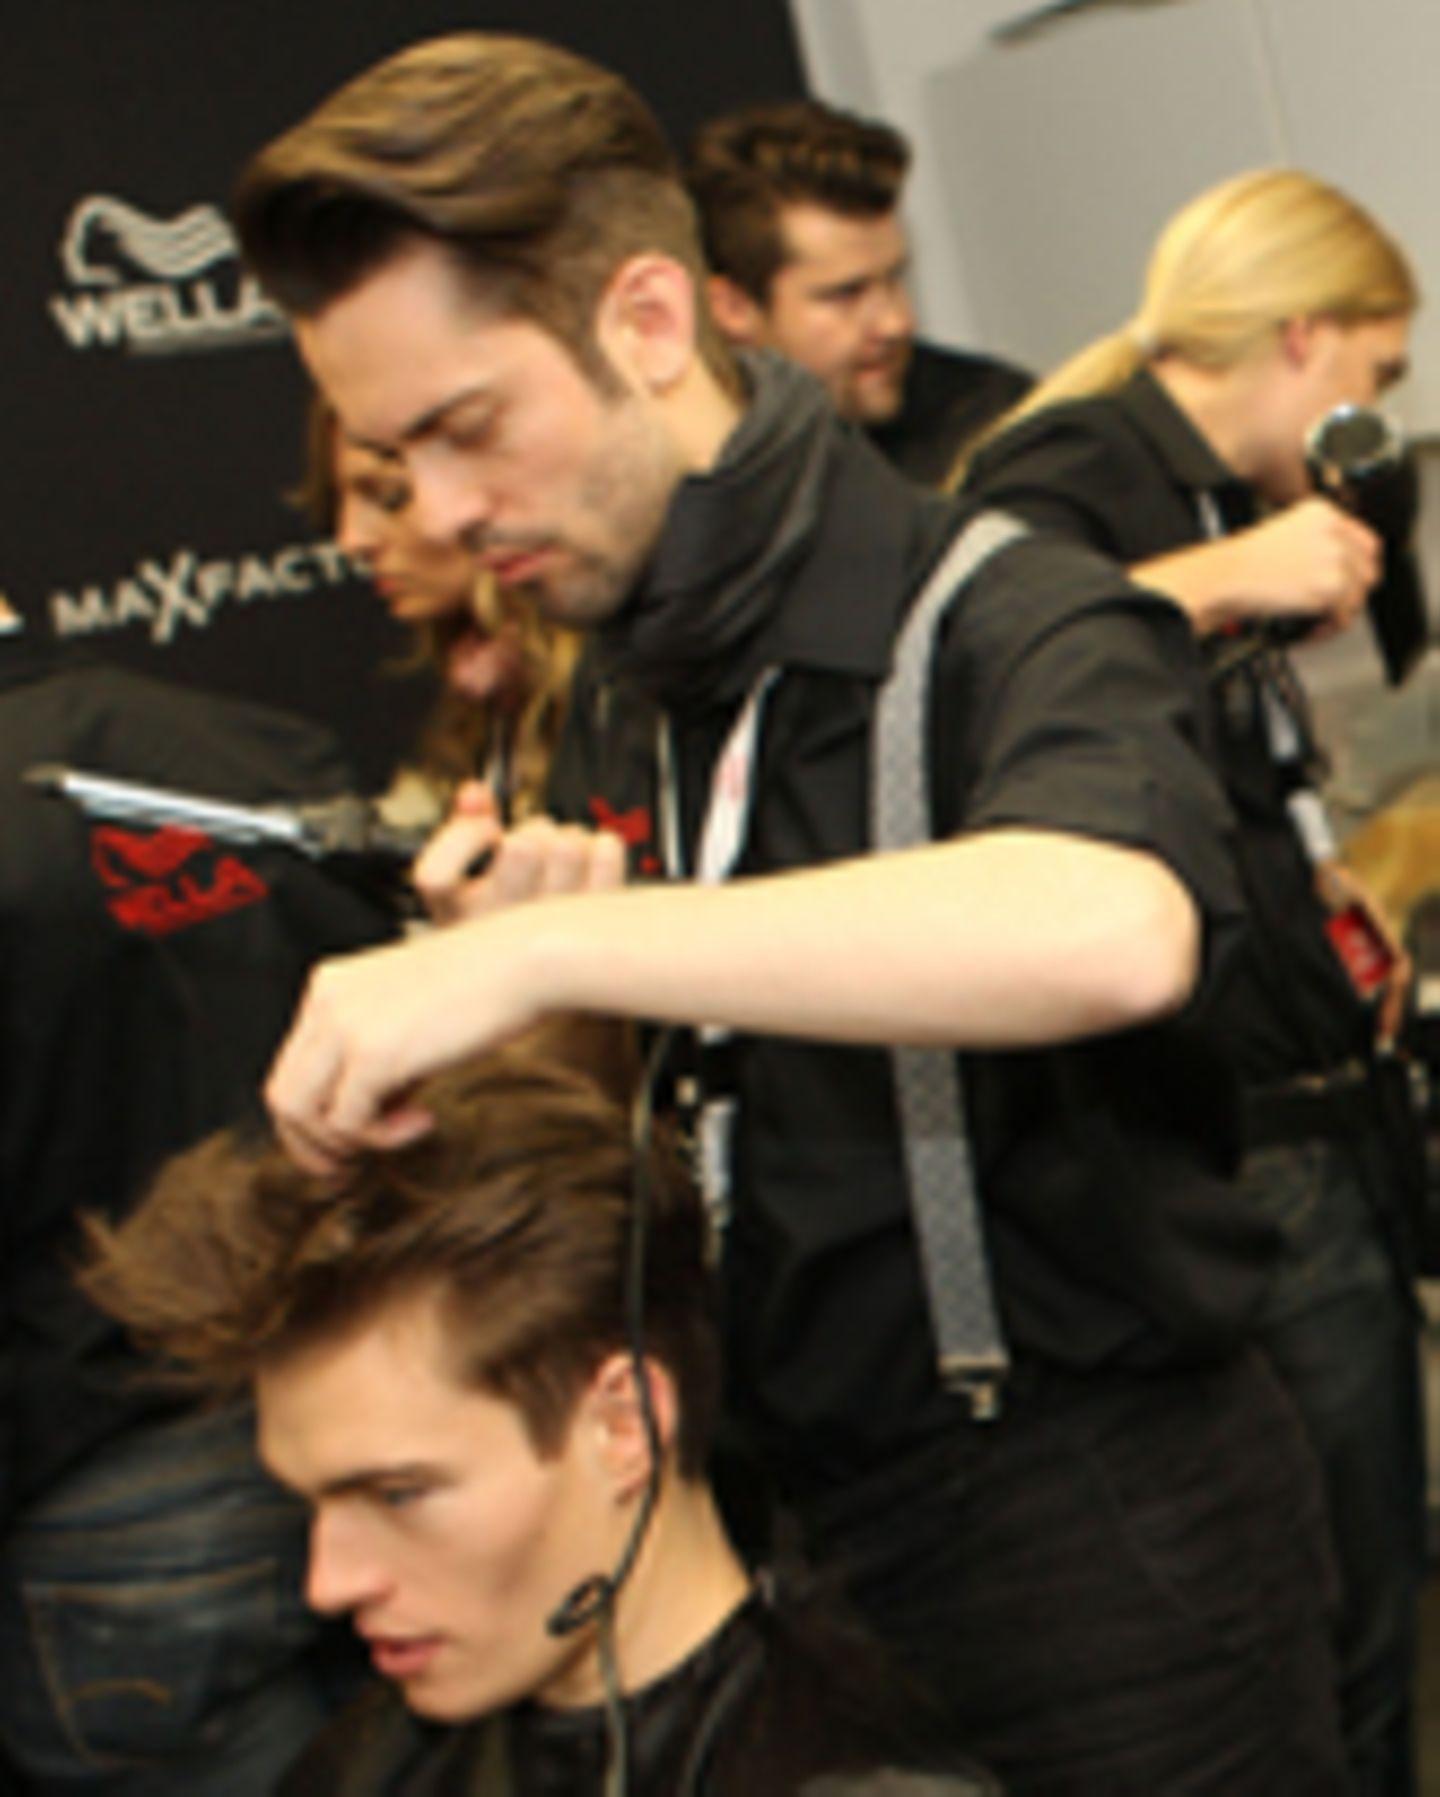 Wella-Professionals-Frisuren